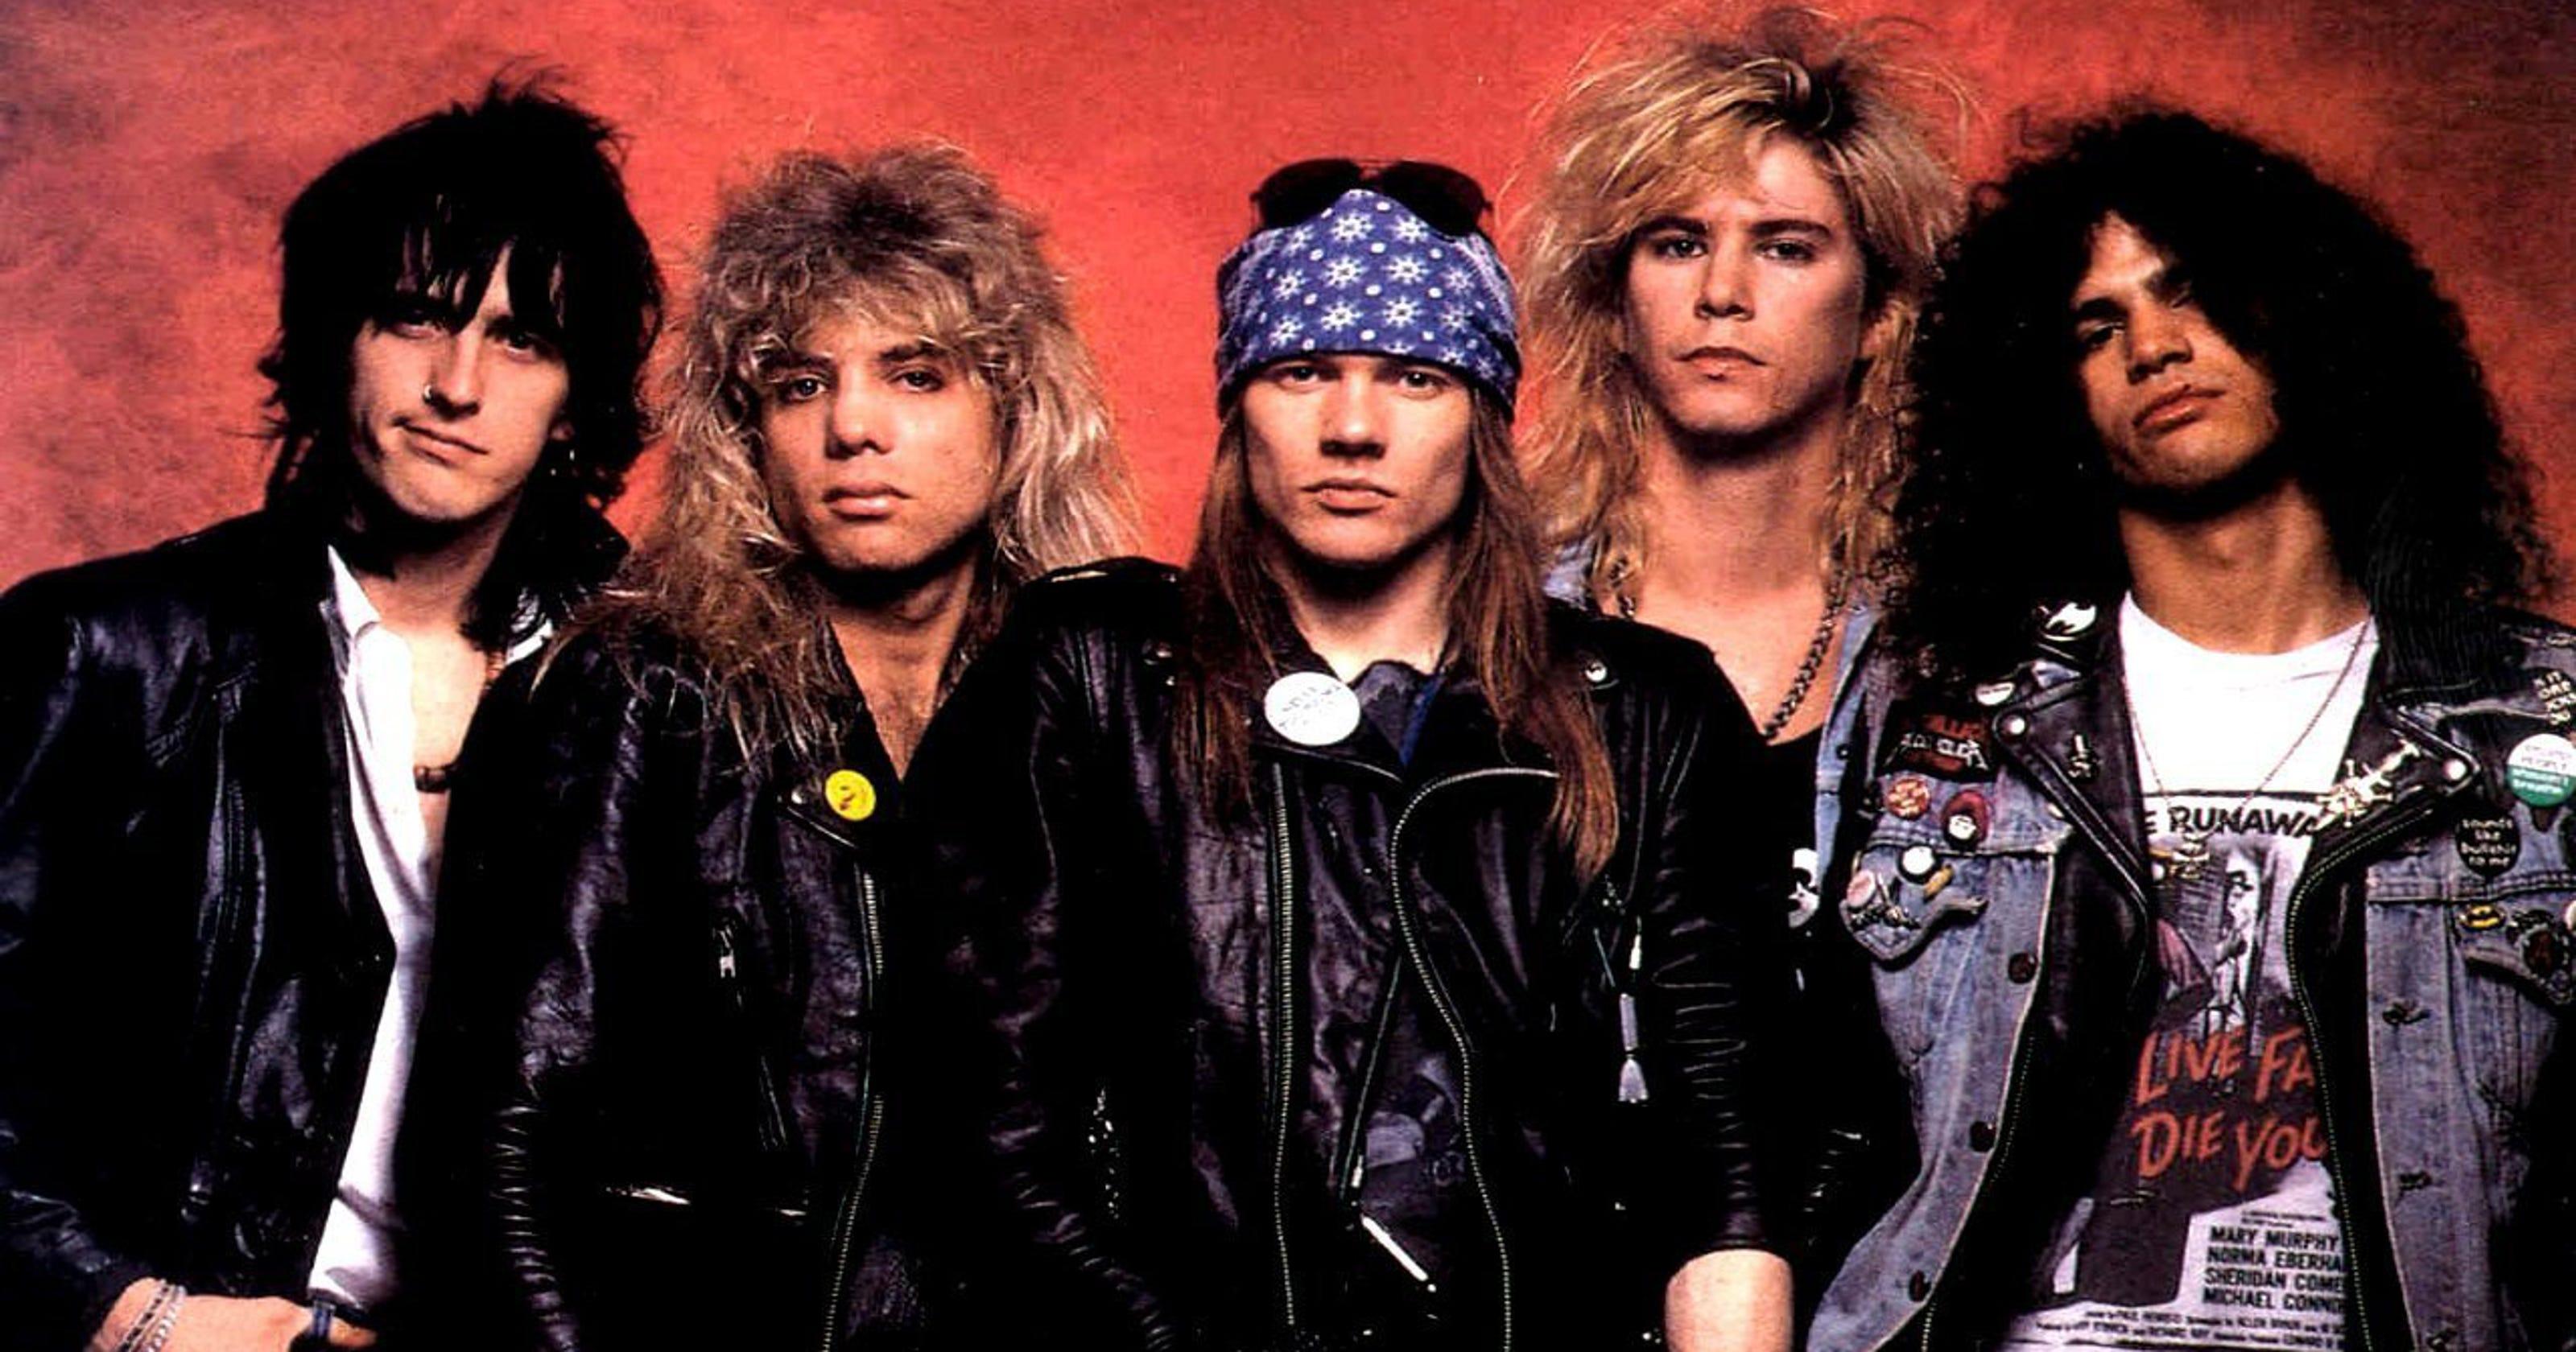 Best Guns N Roses Songs So Far